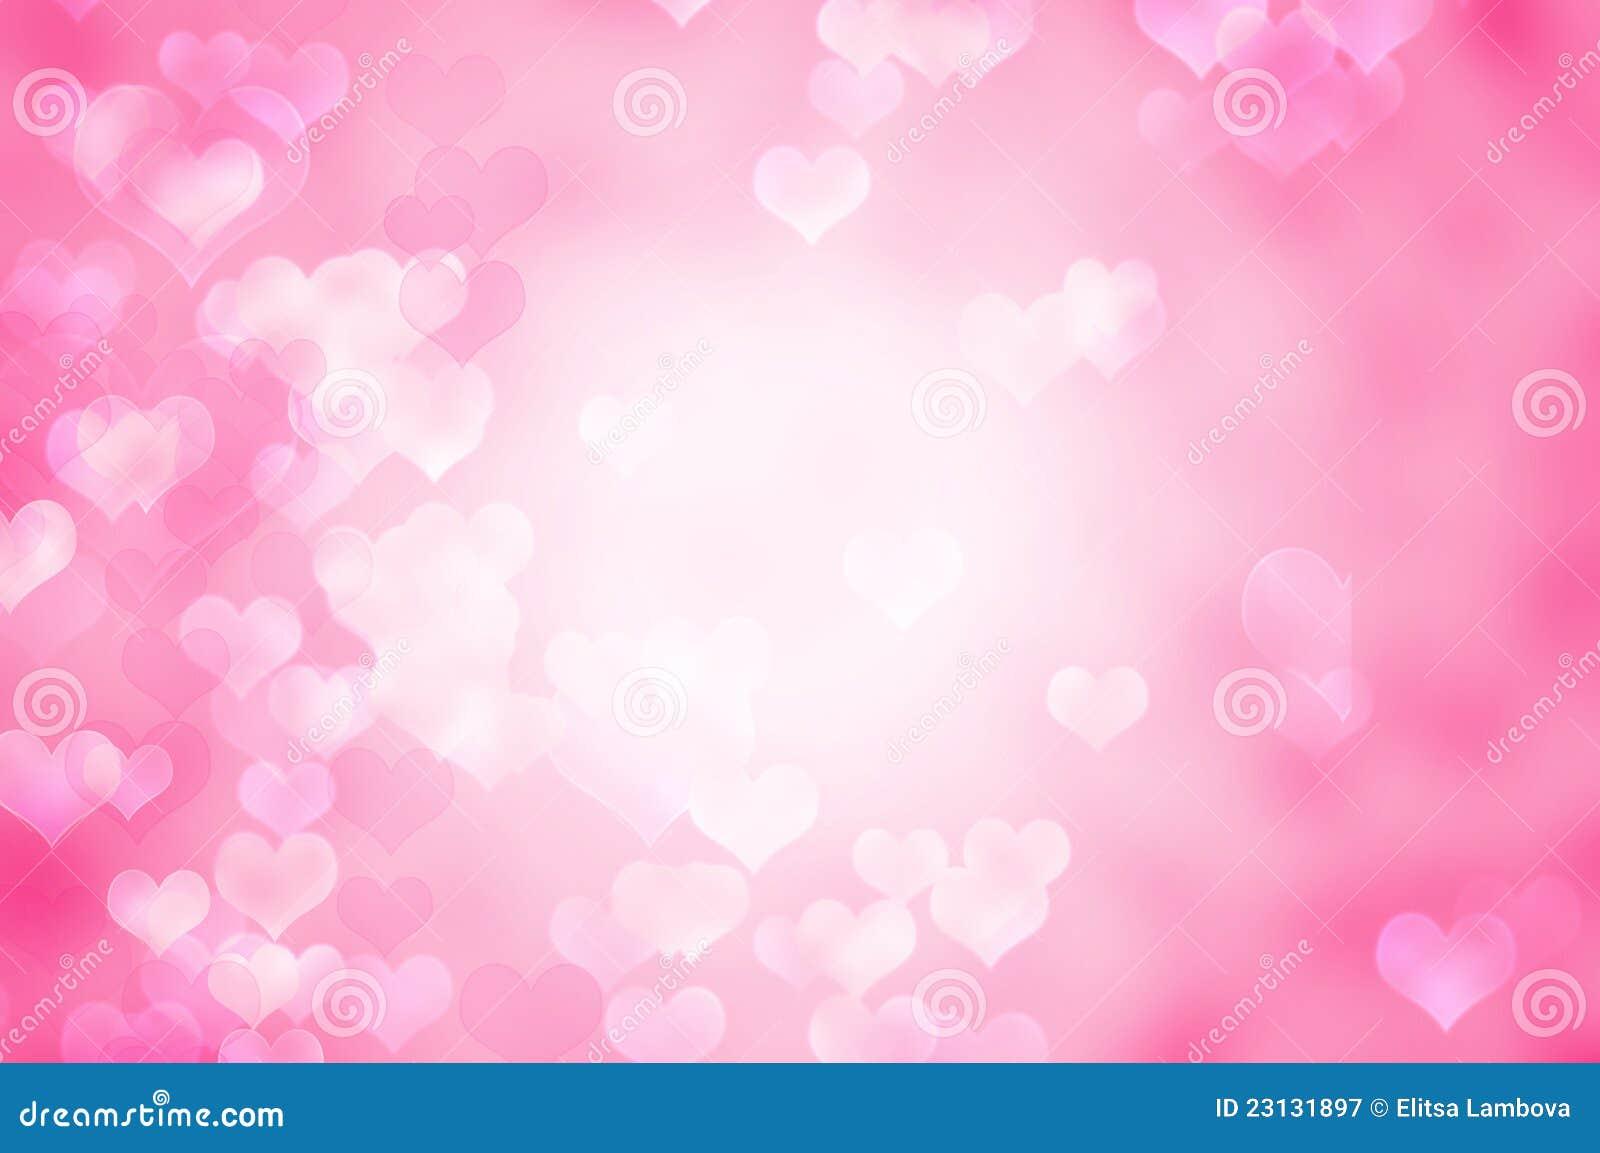 foto de Fundo Cor de rosa Abstrato Fotografia de Stock Royalty Free Imagem: 23131897